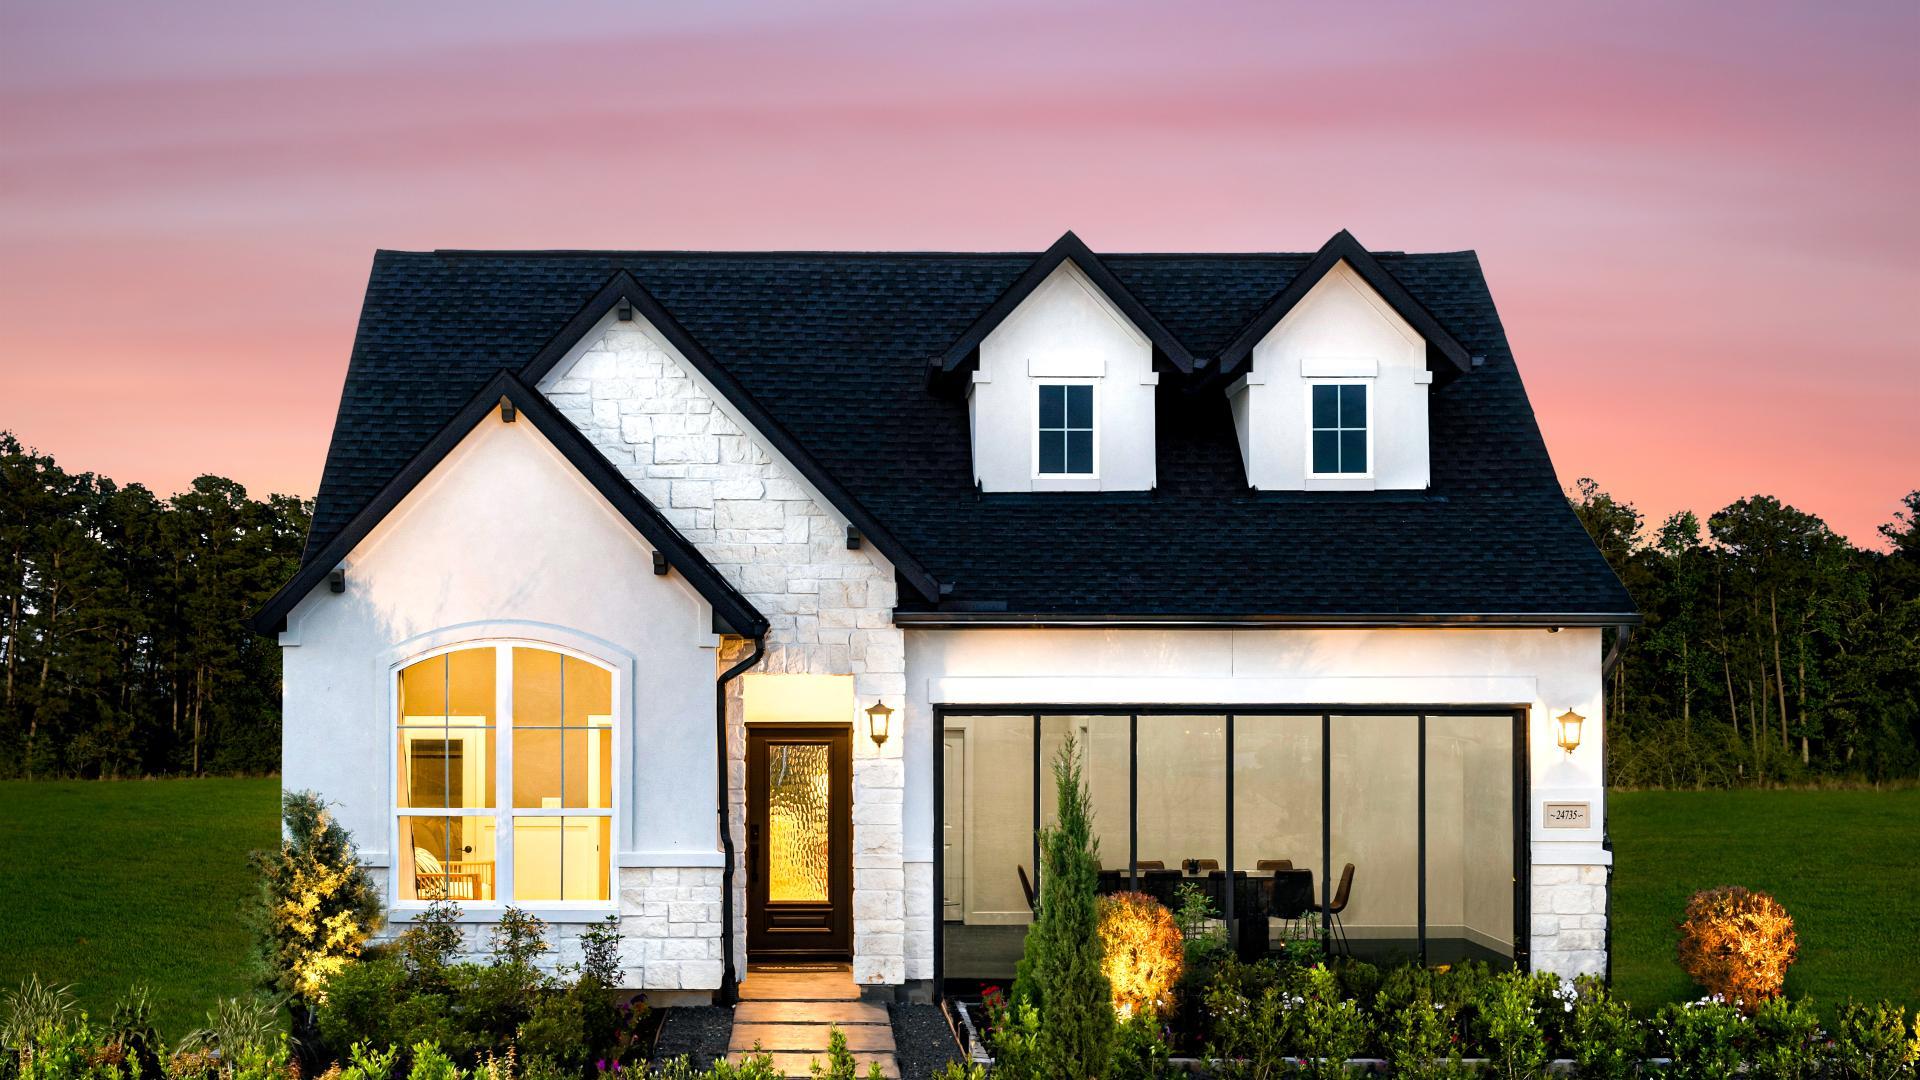 Angelo High Plains Model Home at Lakes at Creekside